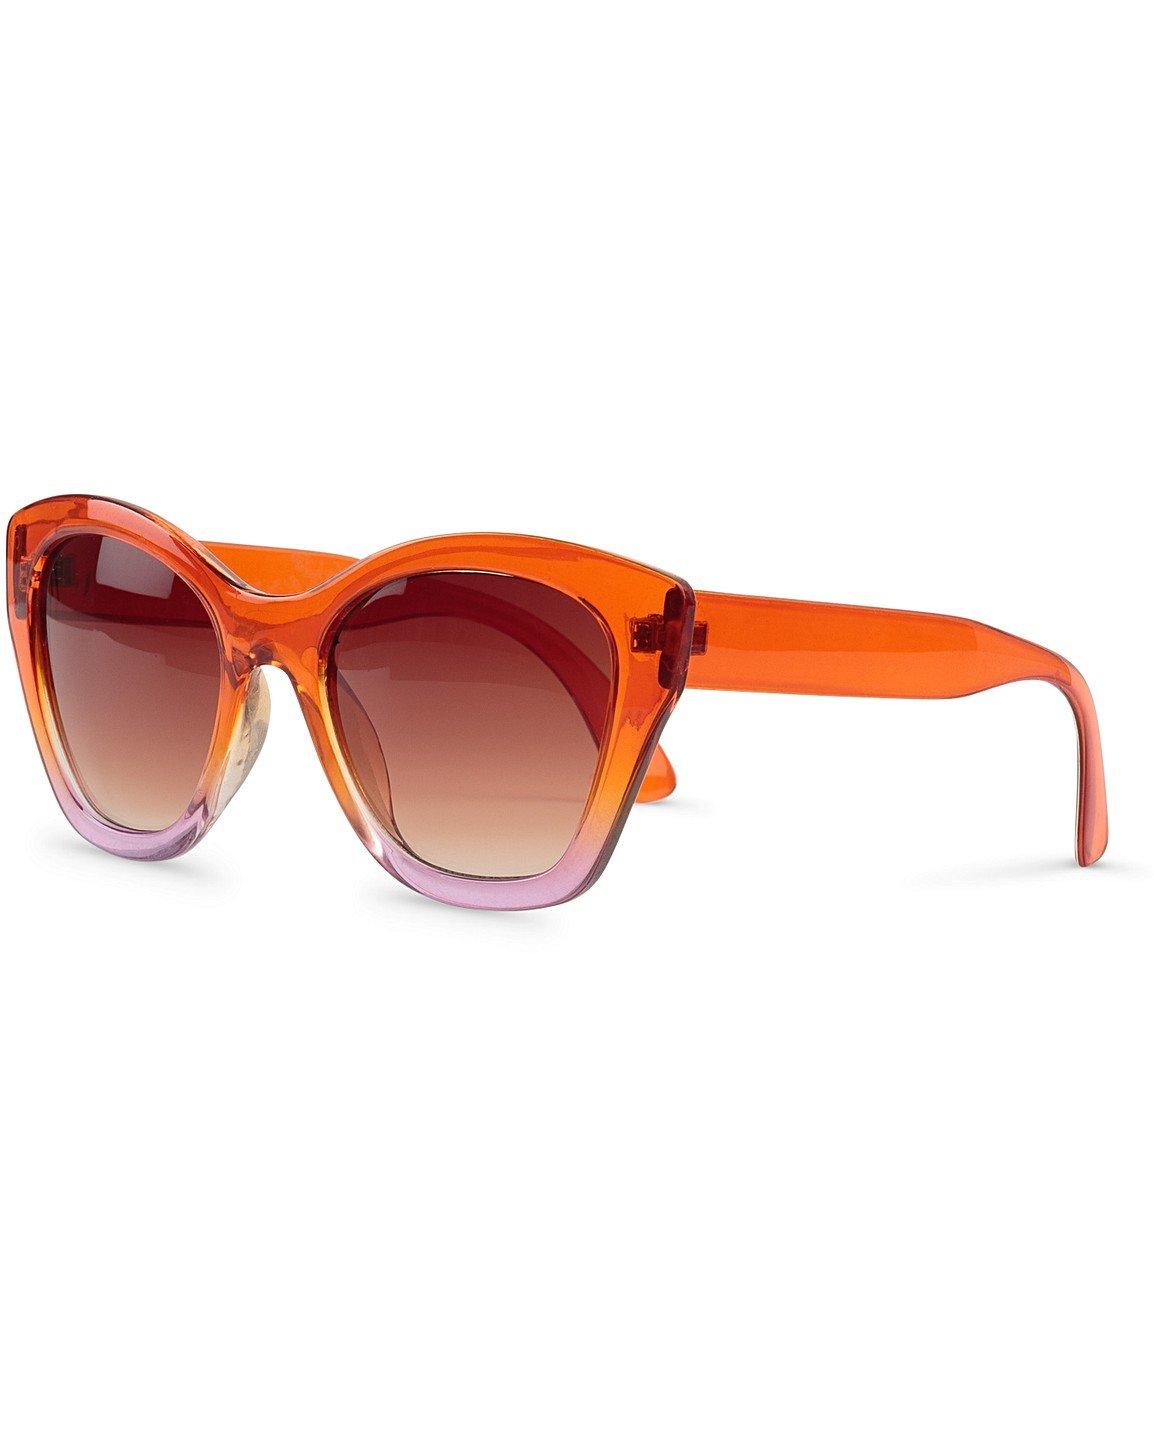 ca438fbfe Ombre Angled Orange & Pink Sunglasses